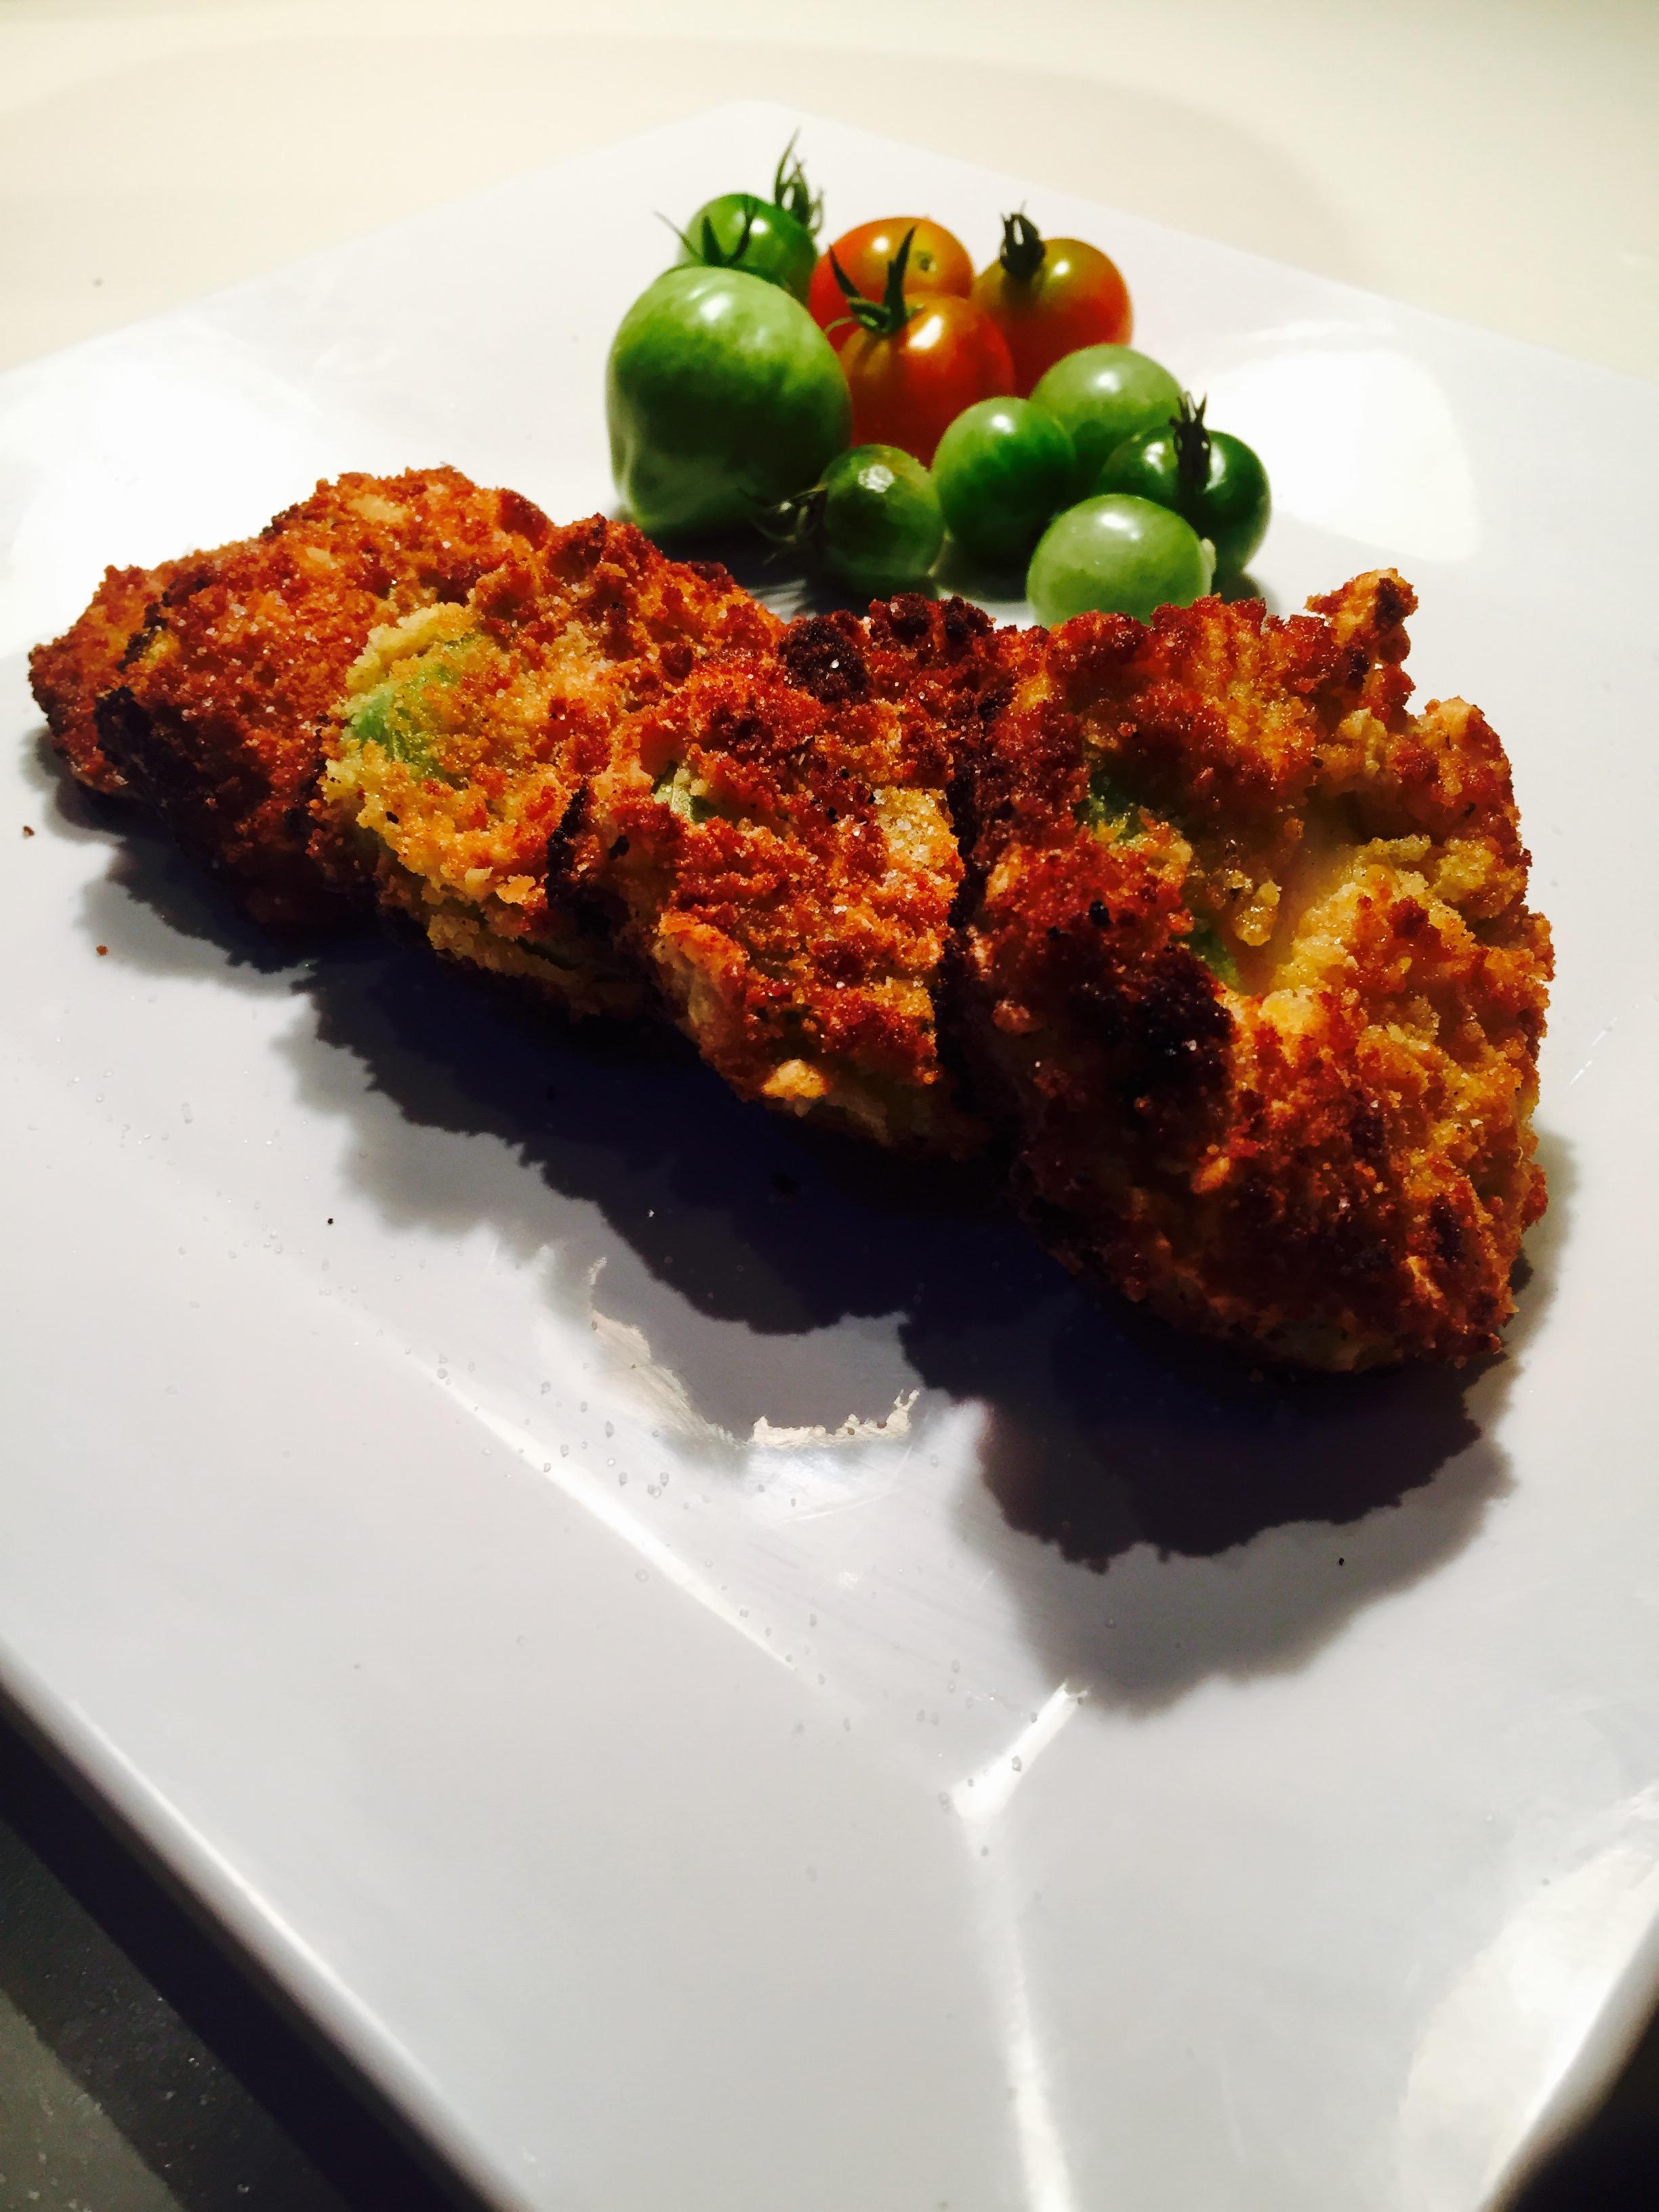 pomodori verdi fritti - photo #49